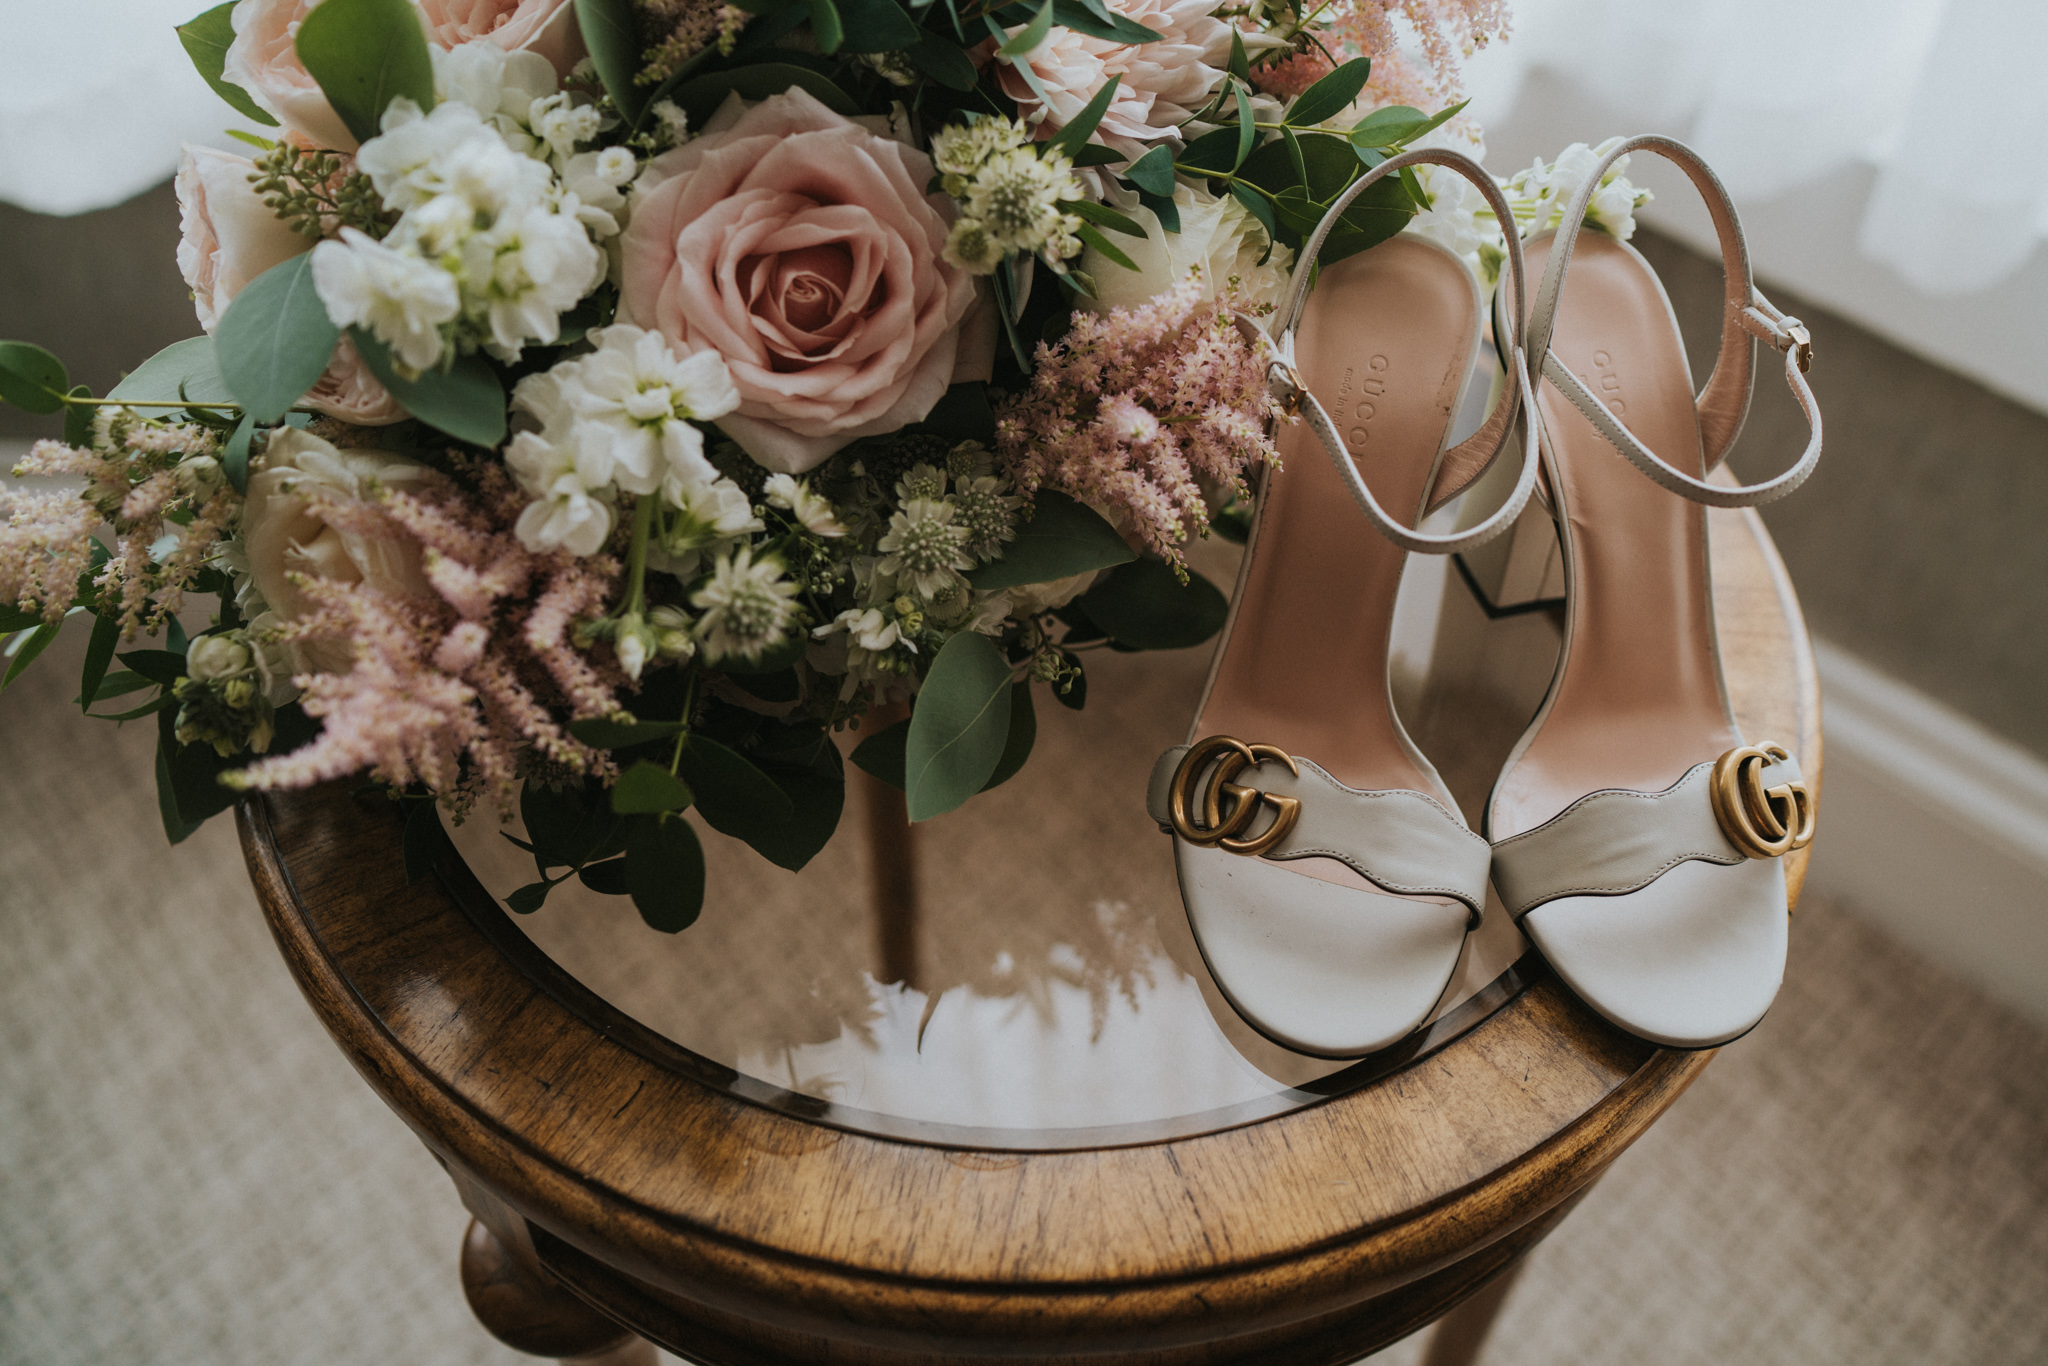 Sarah-Alex-Wivenhoe-House-St-Osyth-Church-Intimate-Wedding-Grace-Elizabeth-Colchester-Essex-Alternative-Wedding-Lifestyle-Photographer (2 of 11).jpg